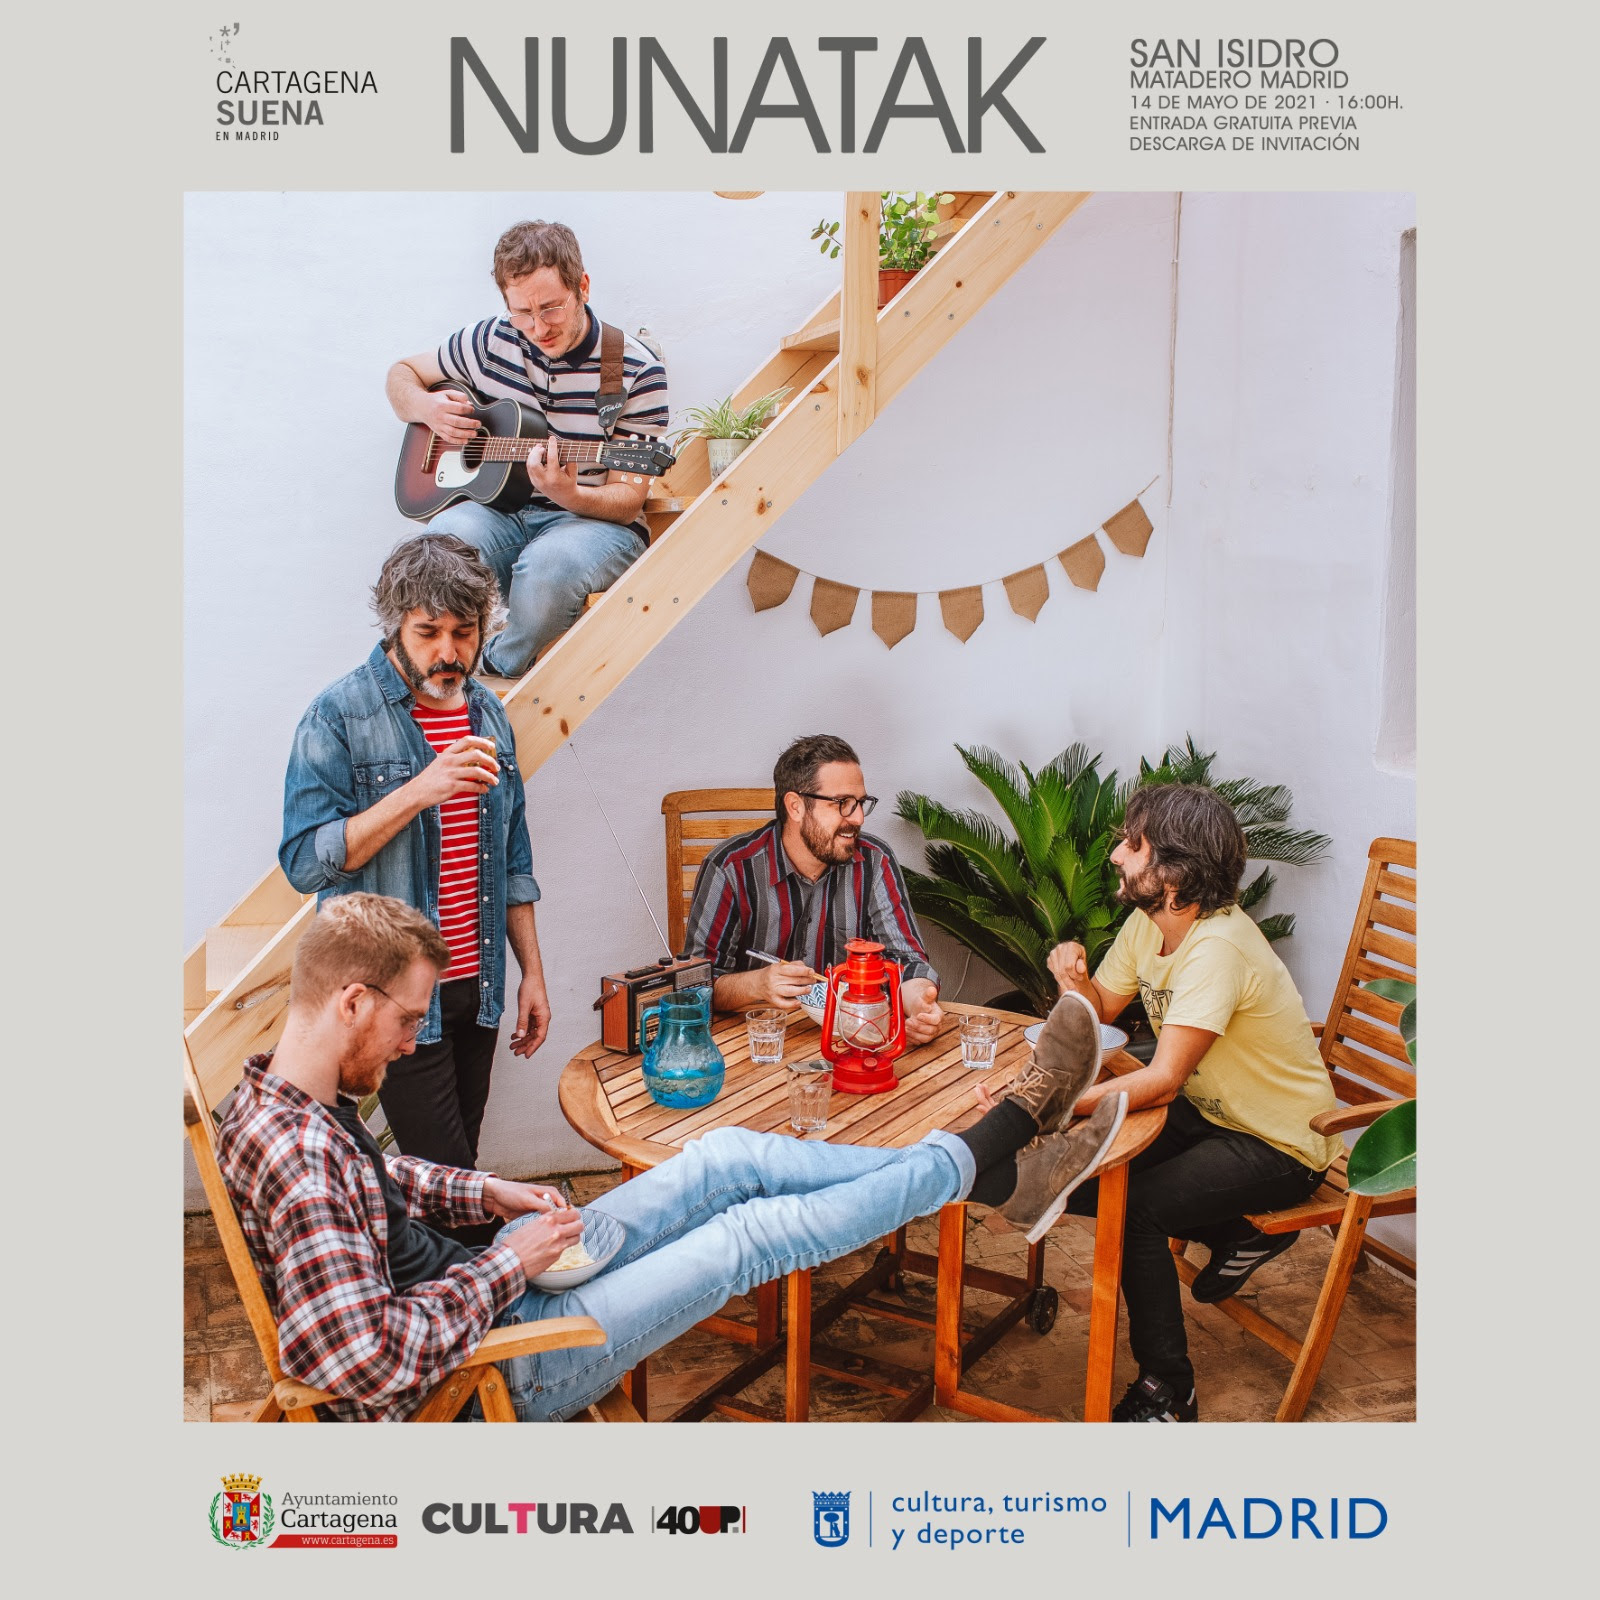 Nunatak - Cartagena Suena